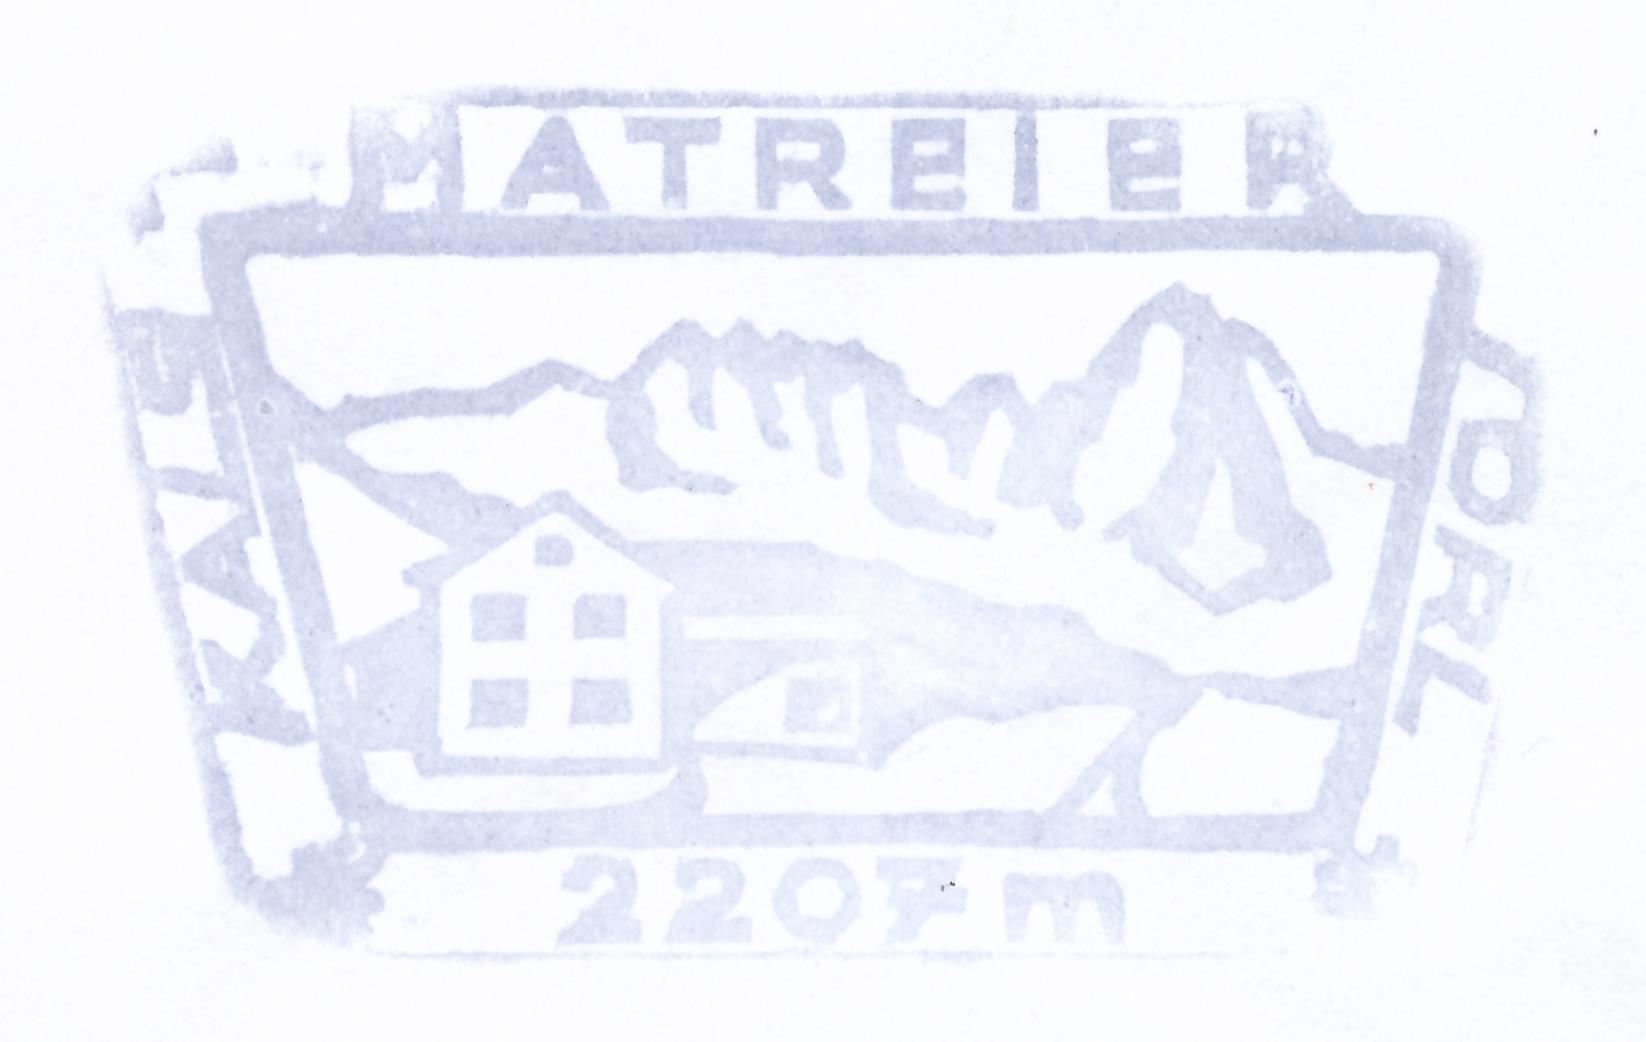 Kals-Matreier-Törl-Haus 2207m